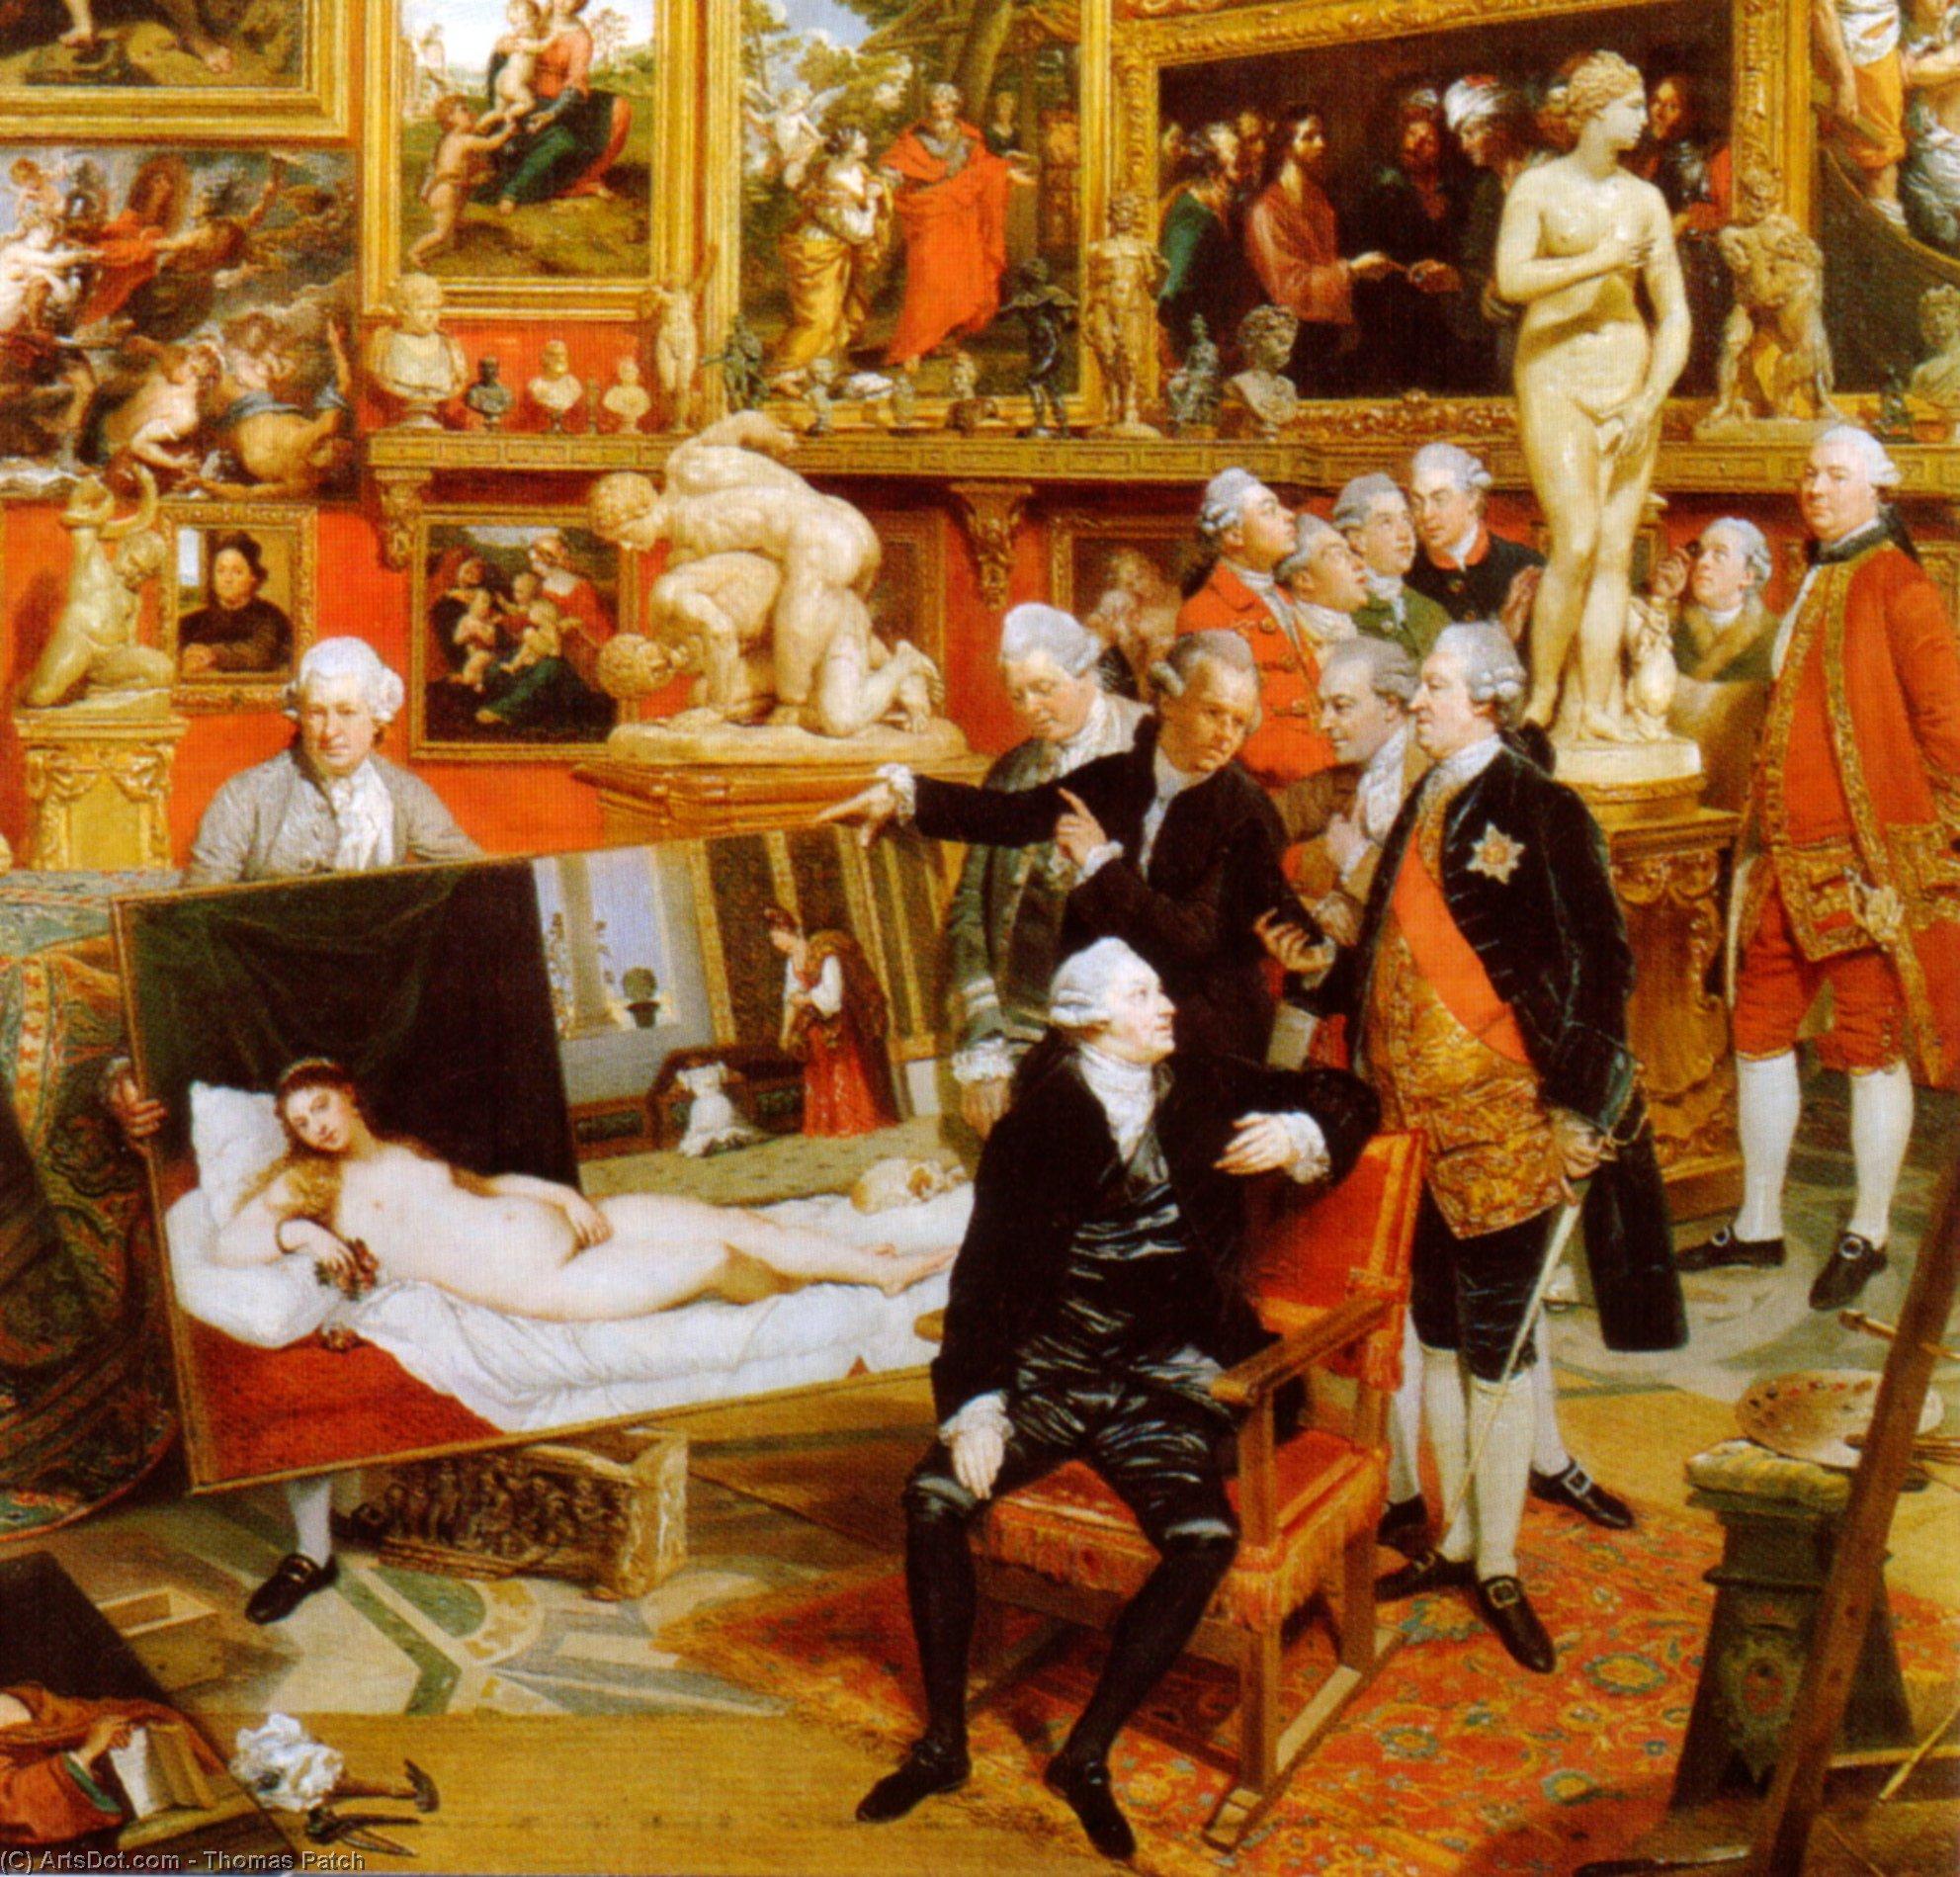 Wikioo.org - The Encyclopedia of Fine Arts - Painting, Artwork by Thomas Patch - La Tribuna Of The Uffizi